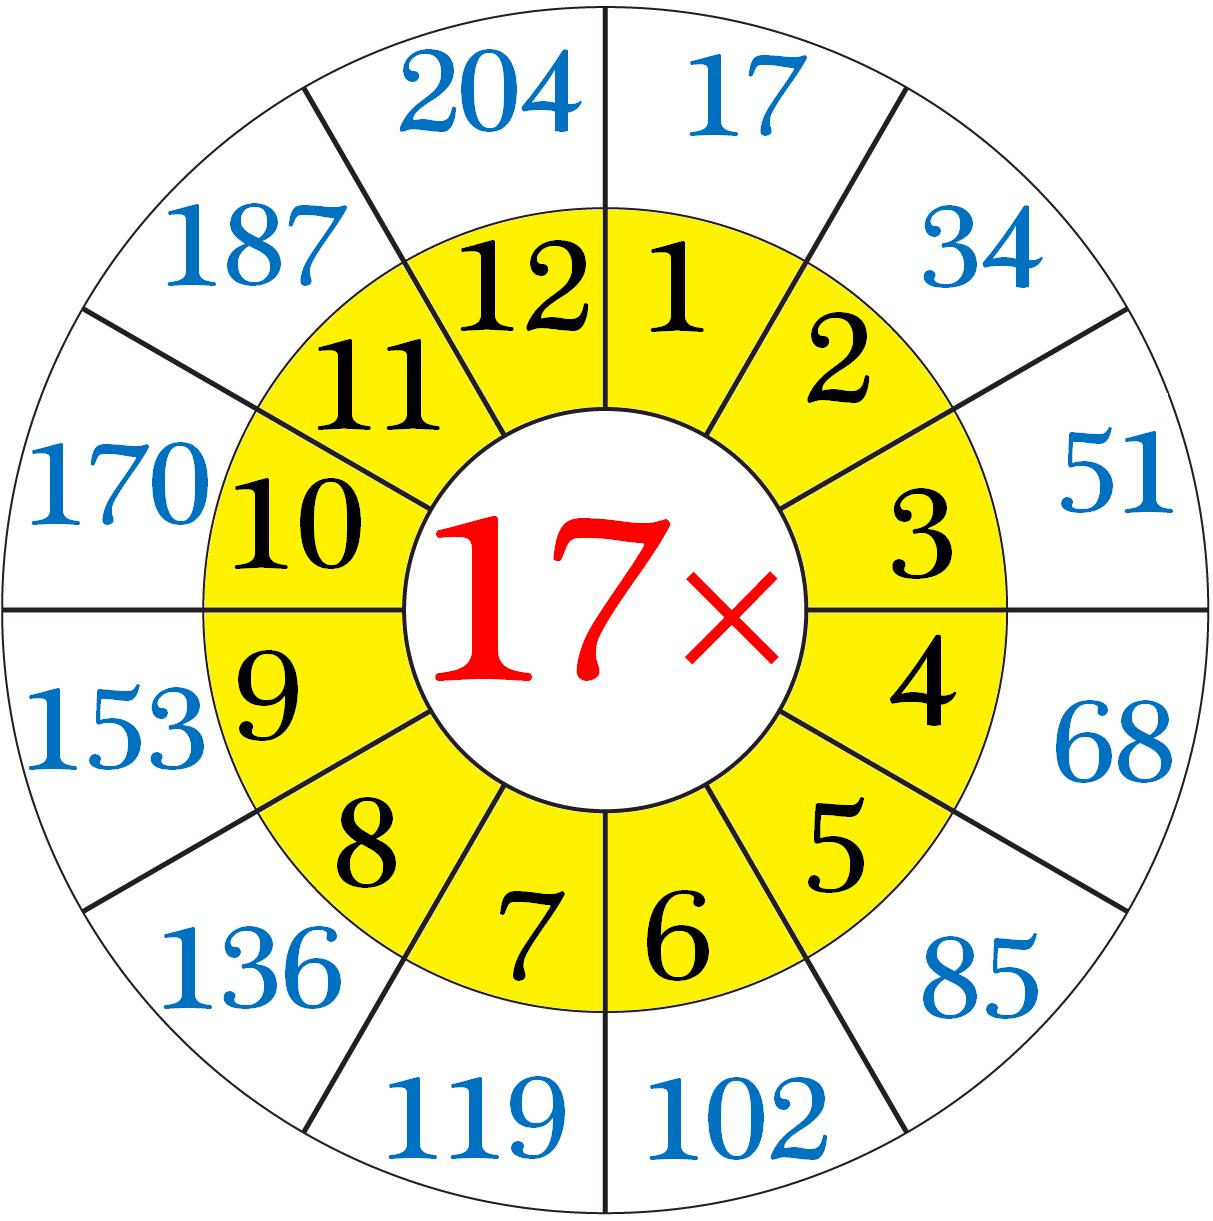 17 Times Multiplication Table Worksheet